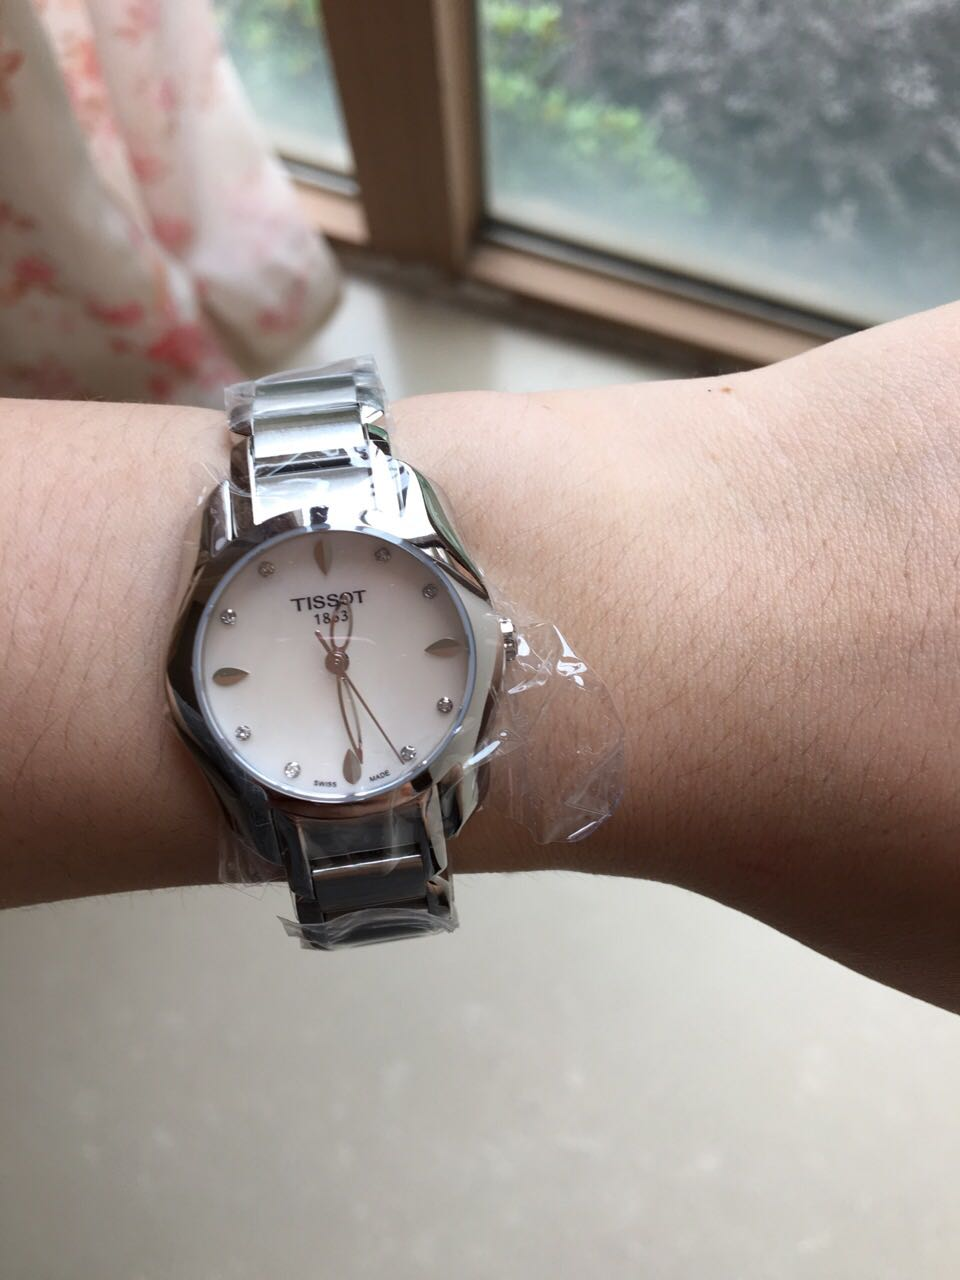 heart monitor watch sale 00299789 store